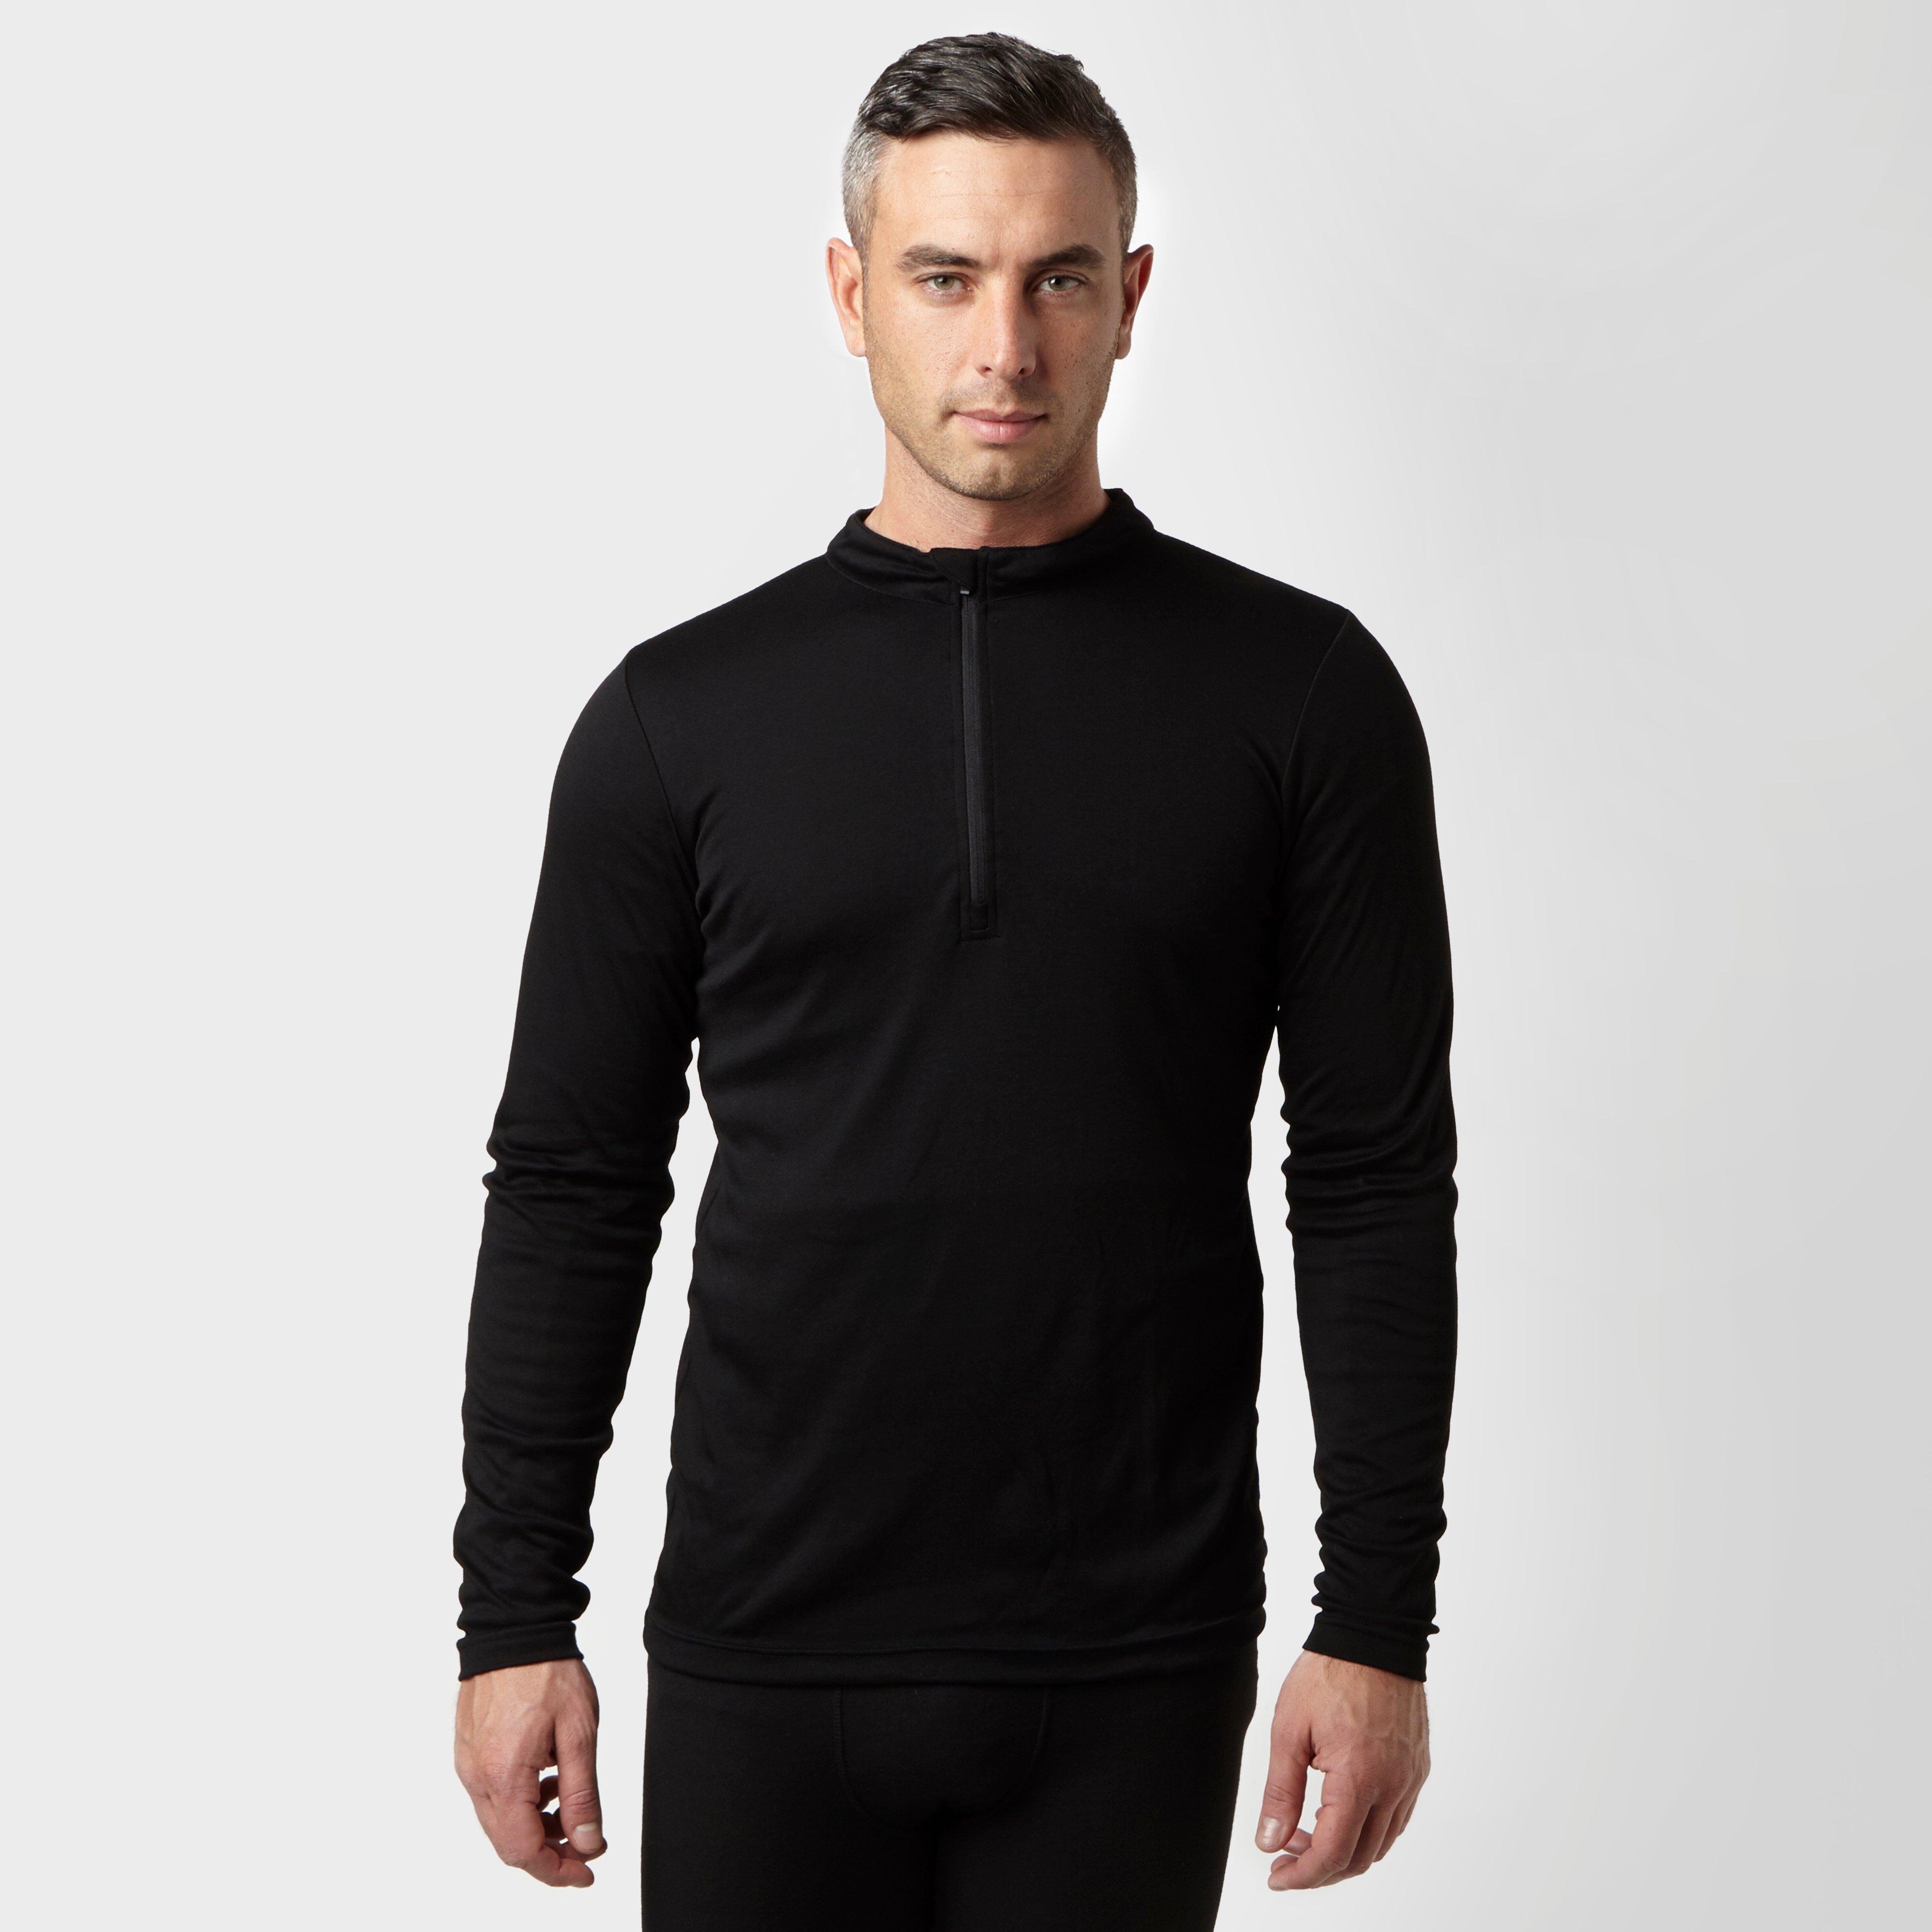 Peter Storm Mens Long Sleeve Thermal Zip Baselayer - Black/blk  Black/blk